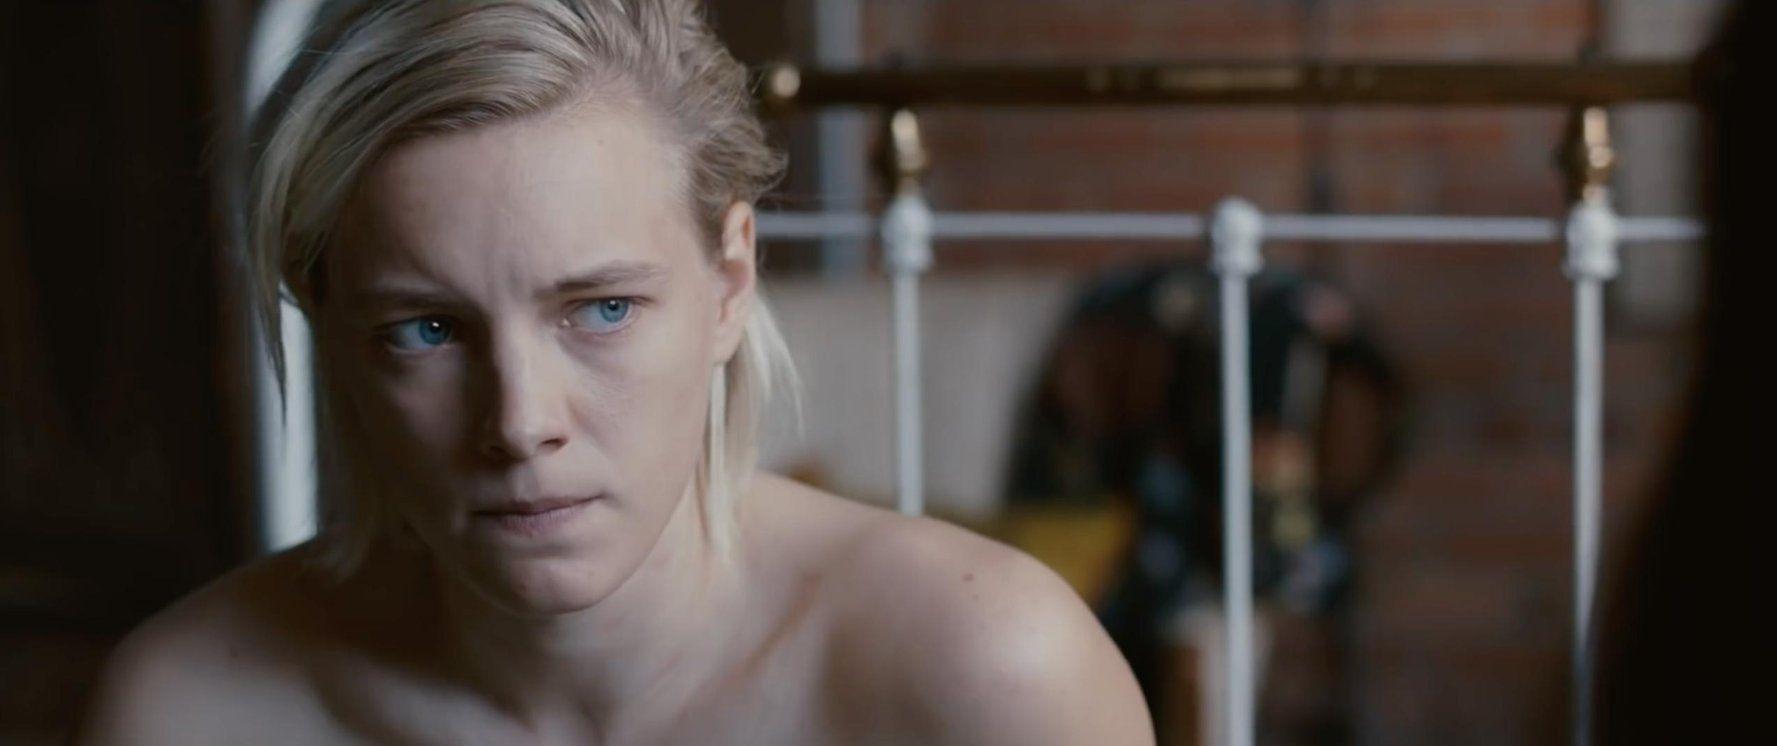 Erika Linder In Below Her Mouth 2016 Imdb Erika Below Her Mouth Movie Under My Skin